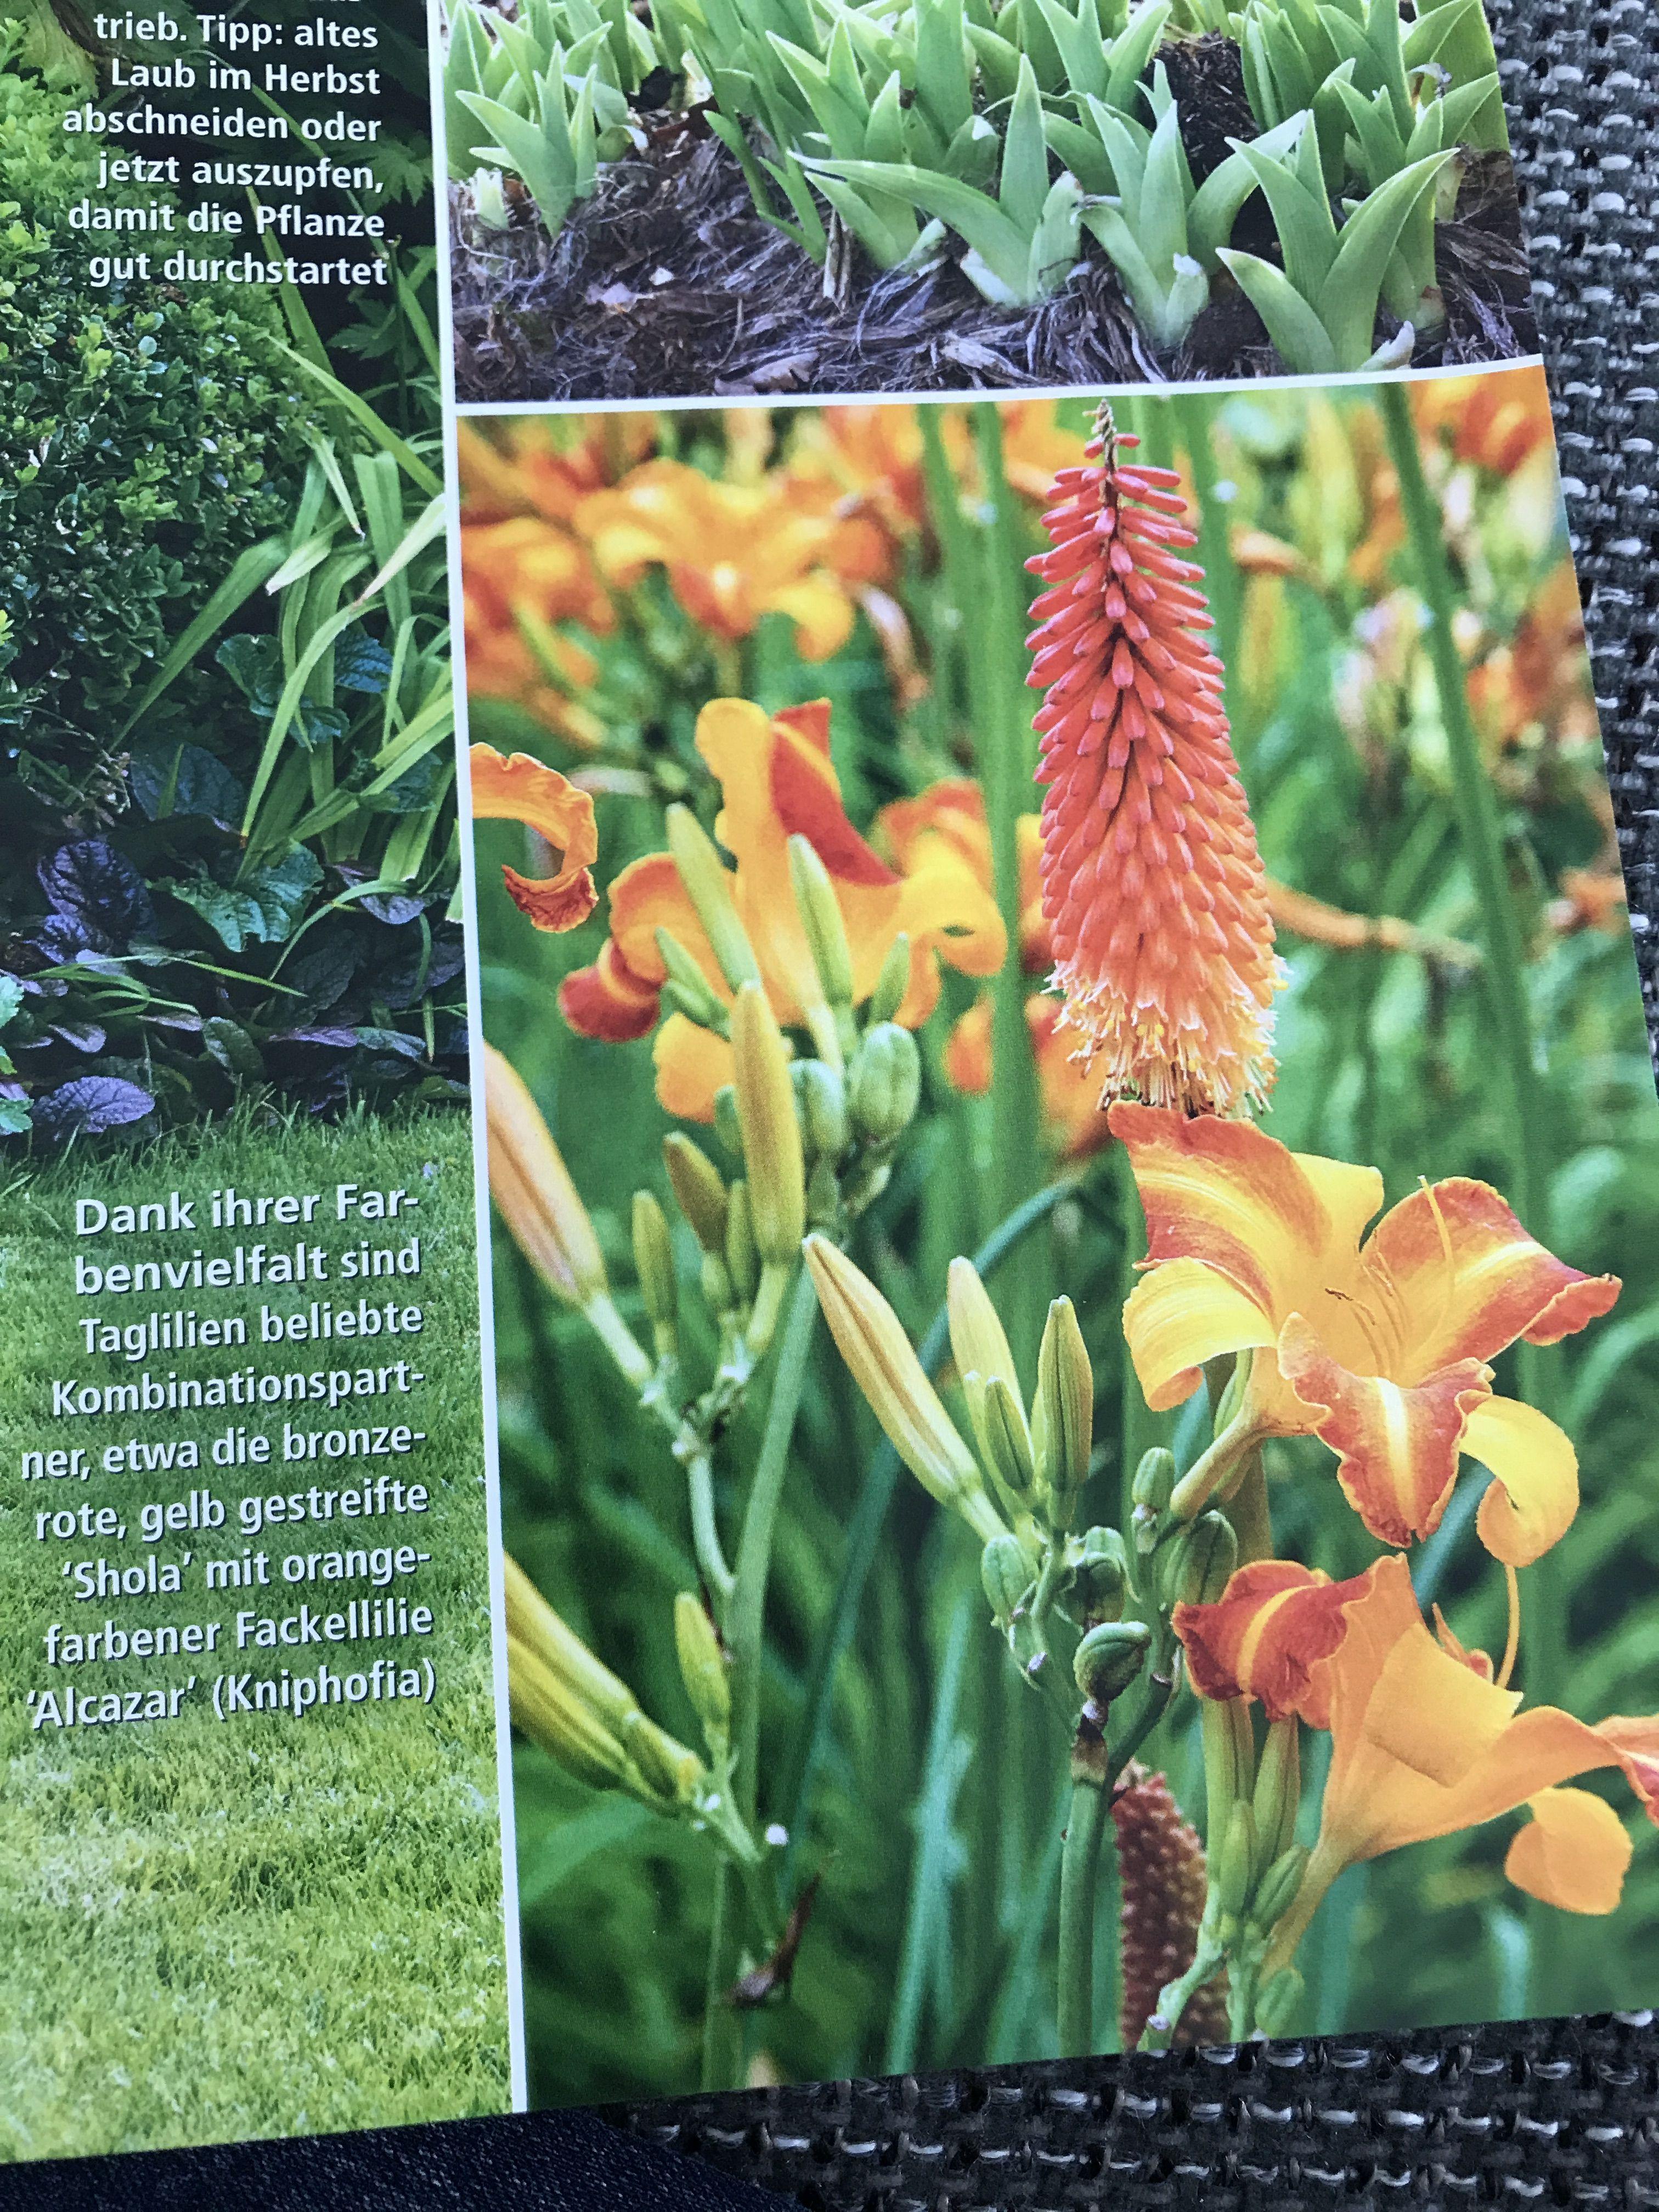 Taglilie Shola Gepaart Mit Fackellilie Alcazar Taglilien Fackellilie Pflanzen